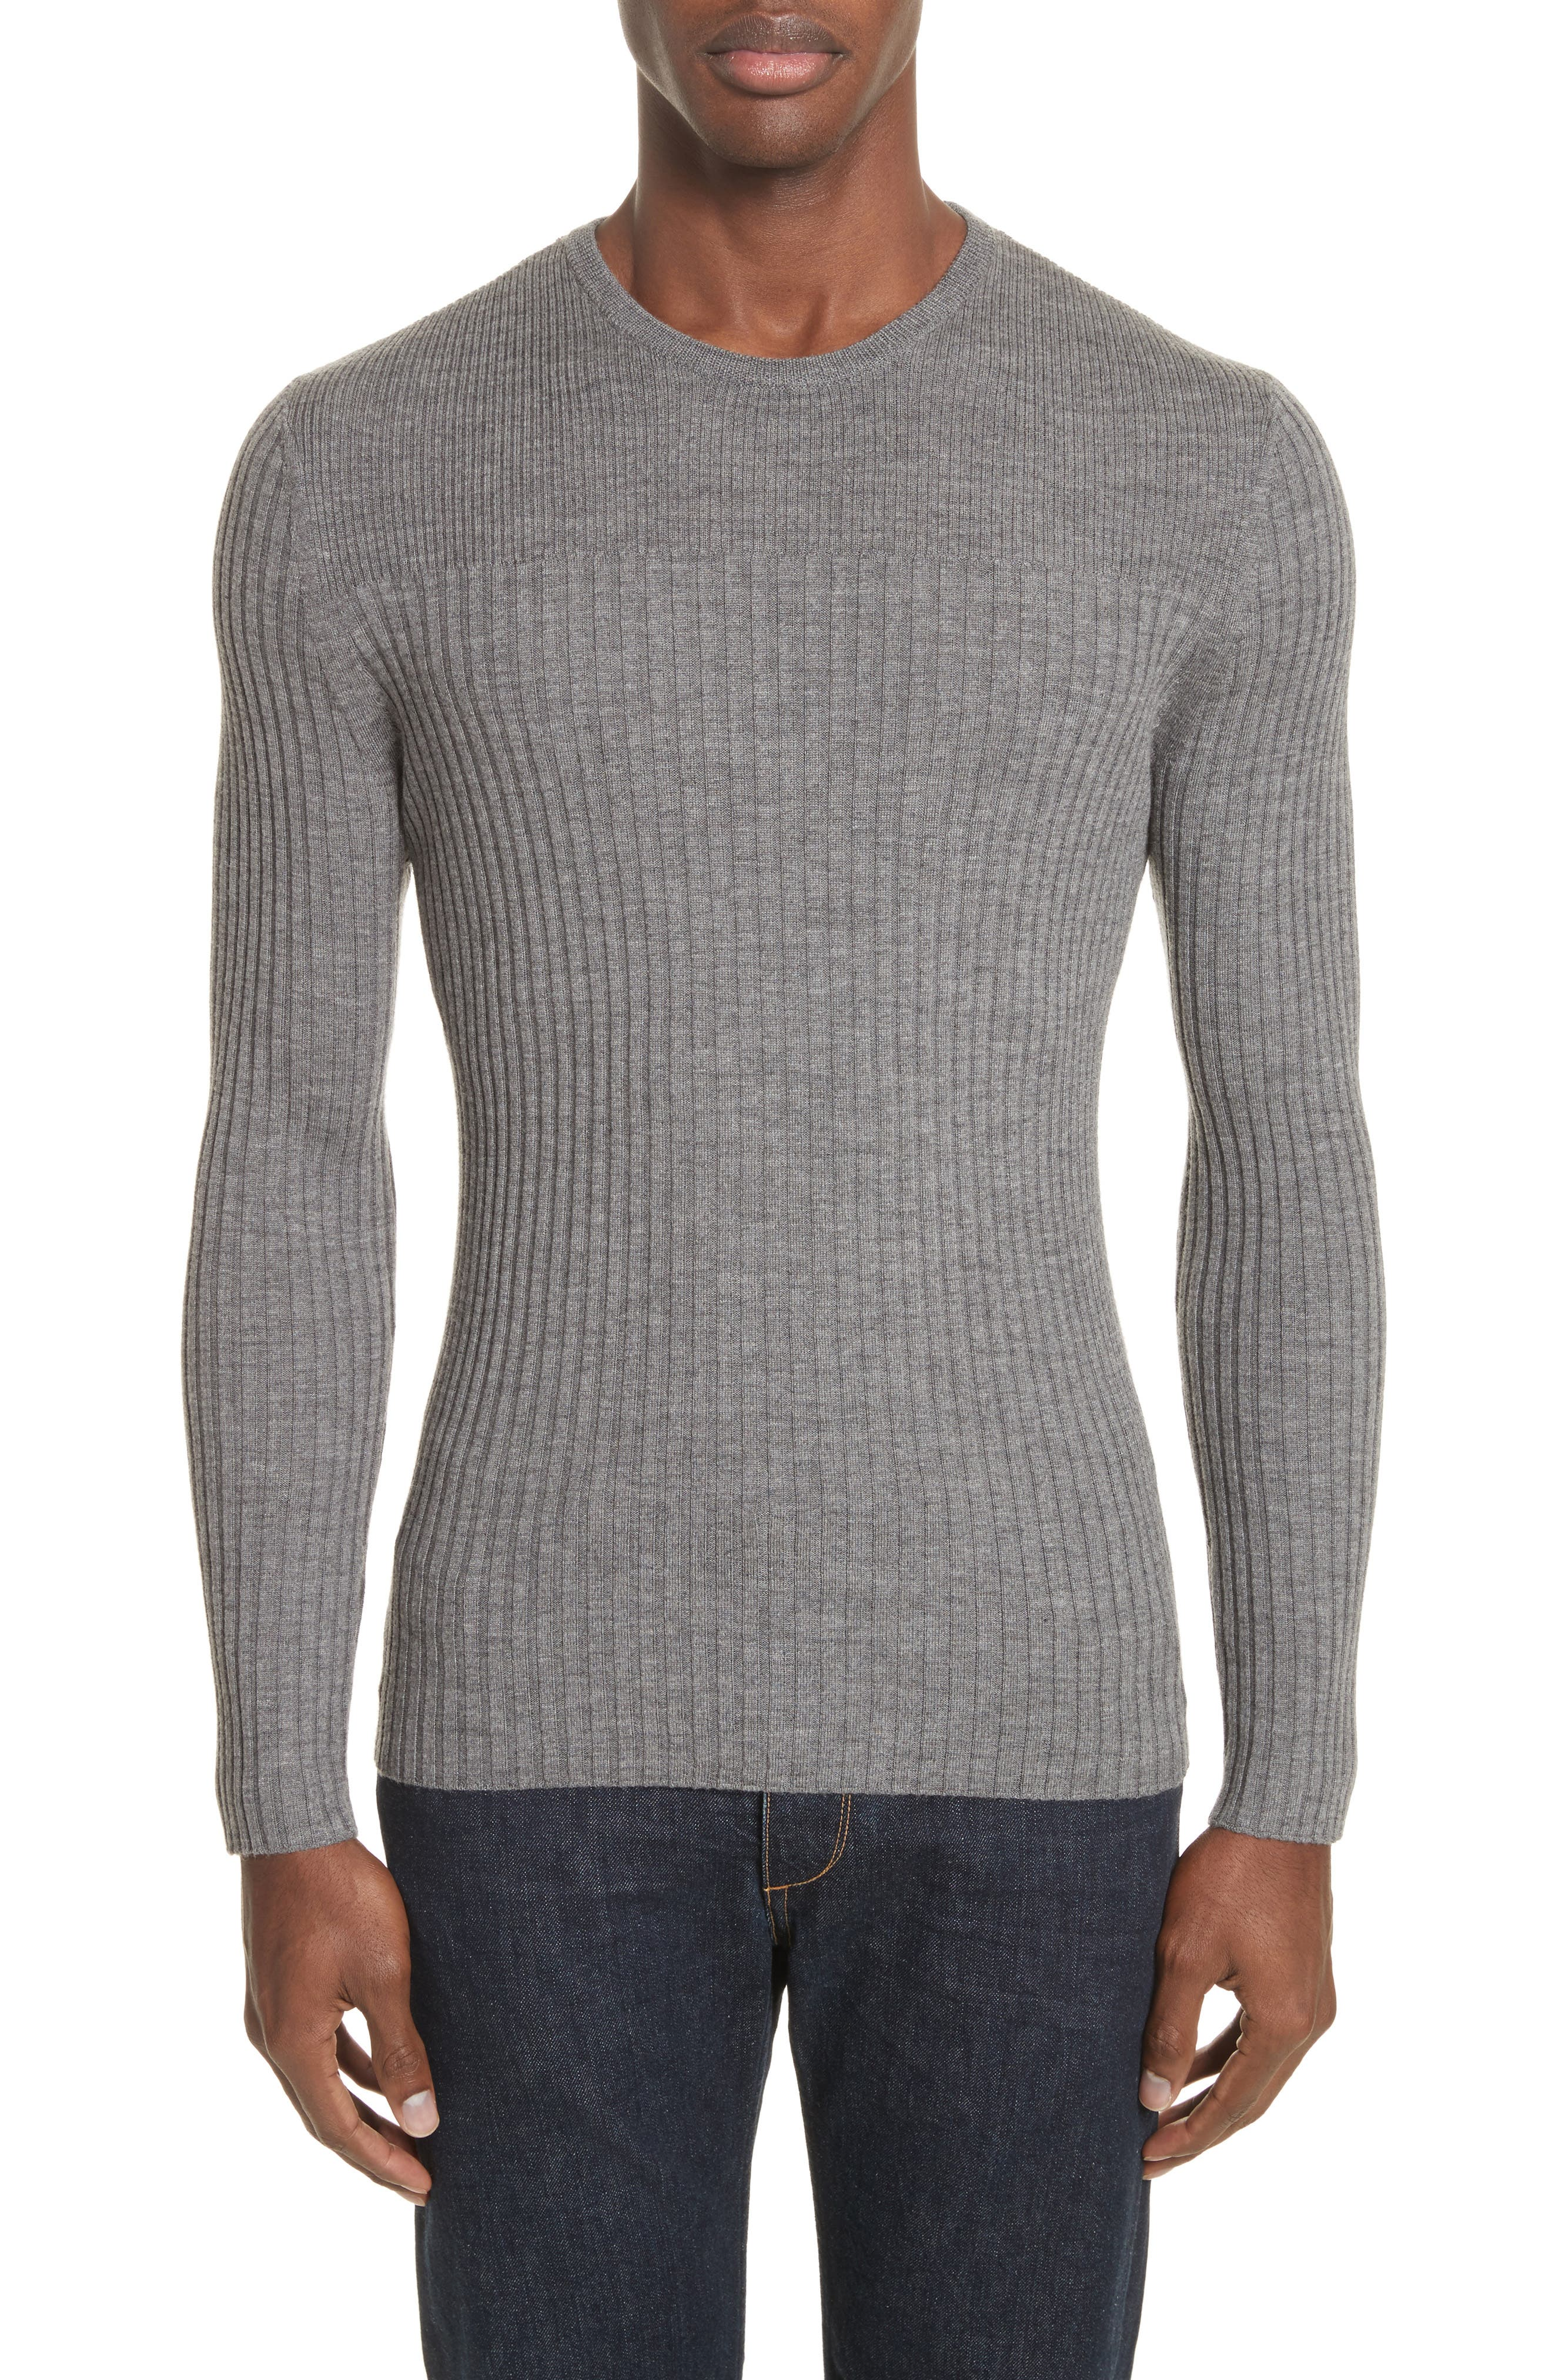 Main Image - ATM Anthony Thomas Melillo Merino Wool Sweater